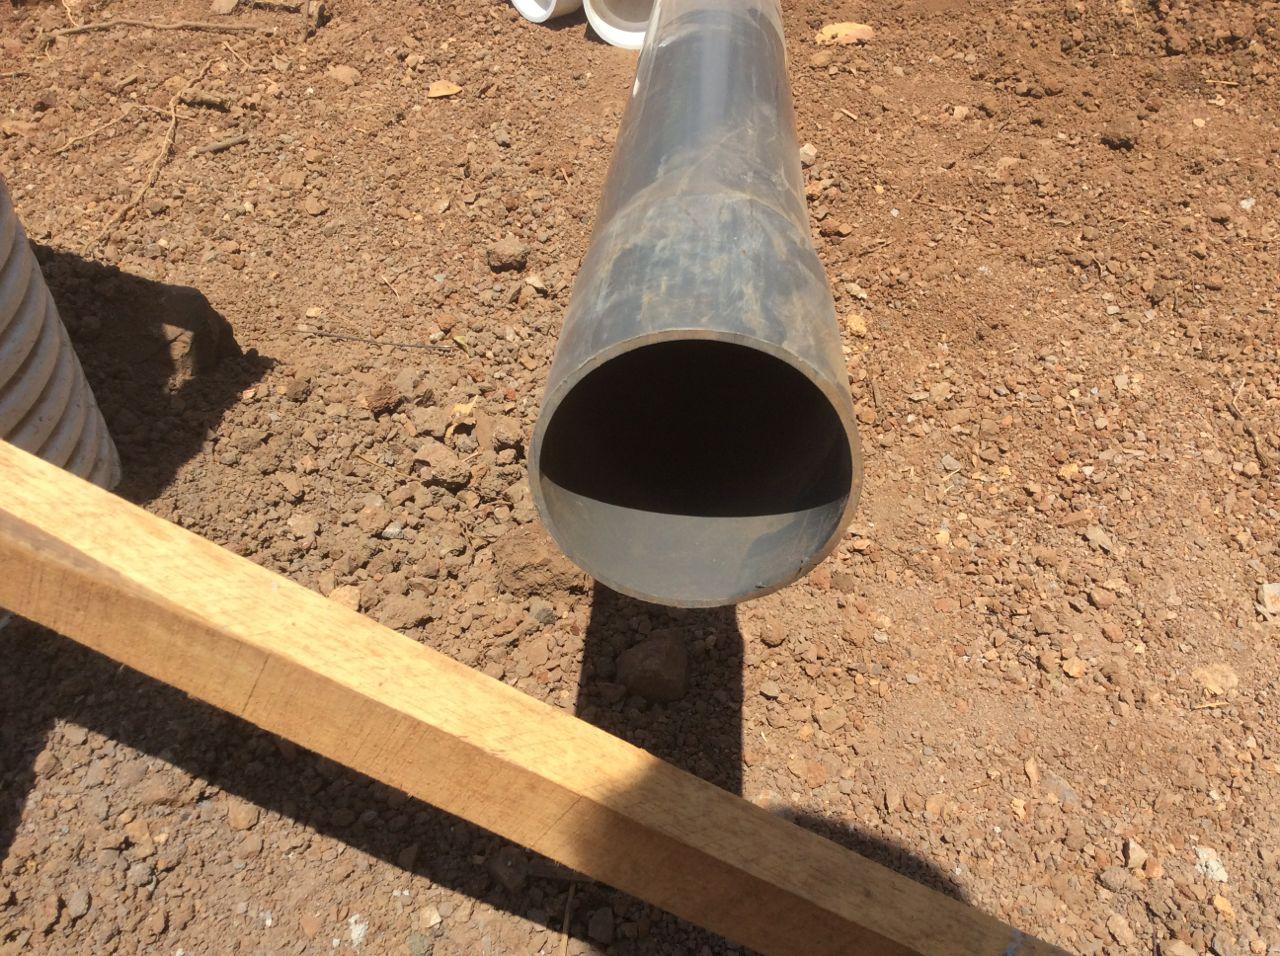 SDR17 pipe